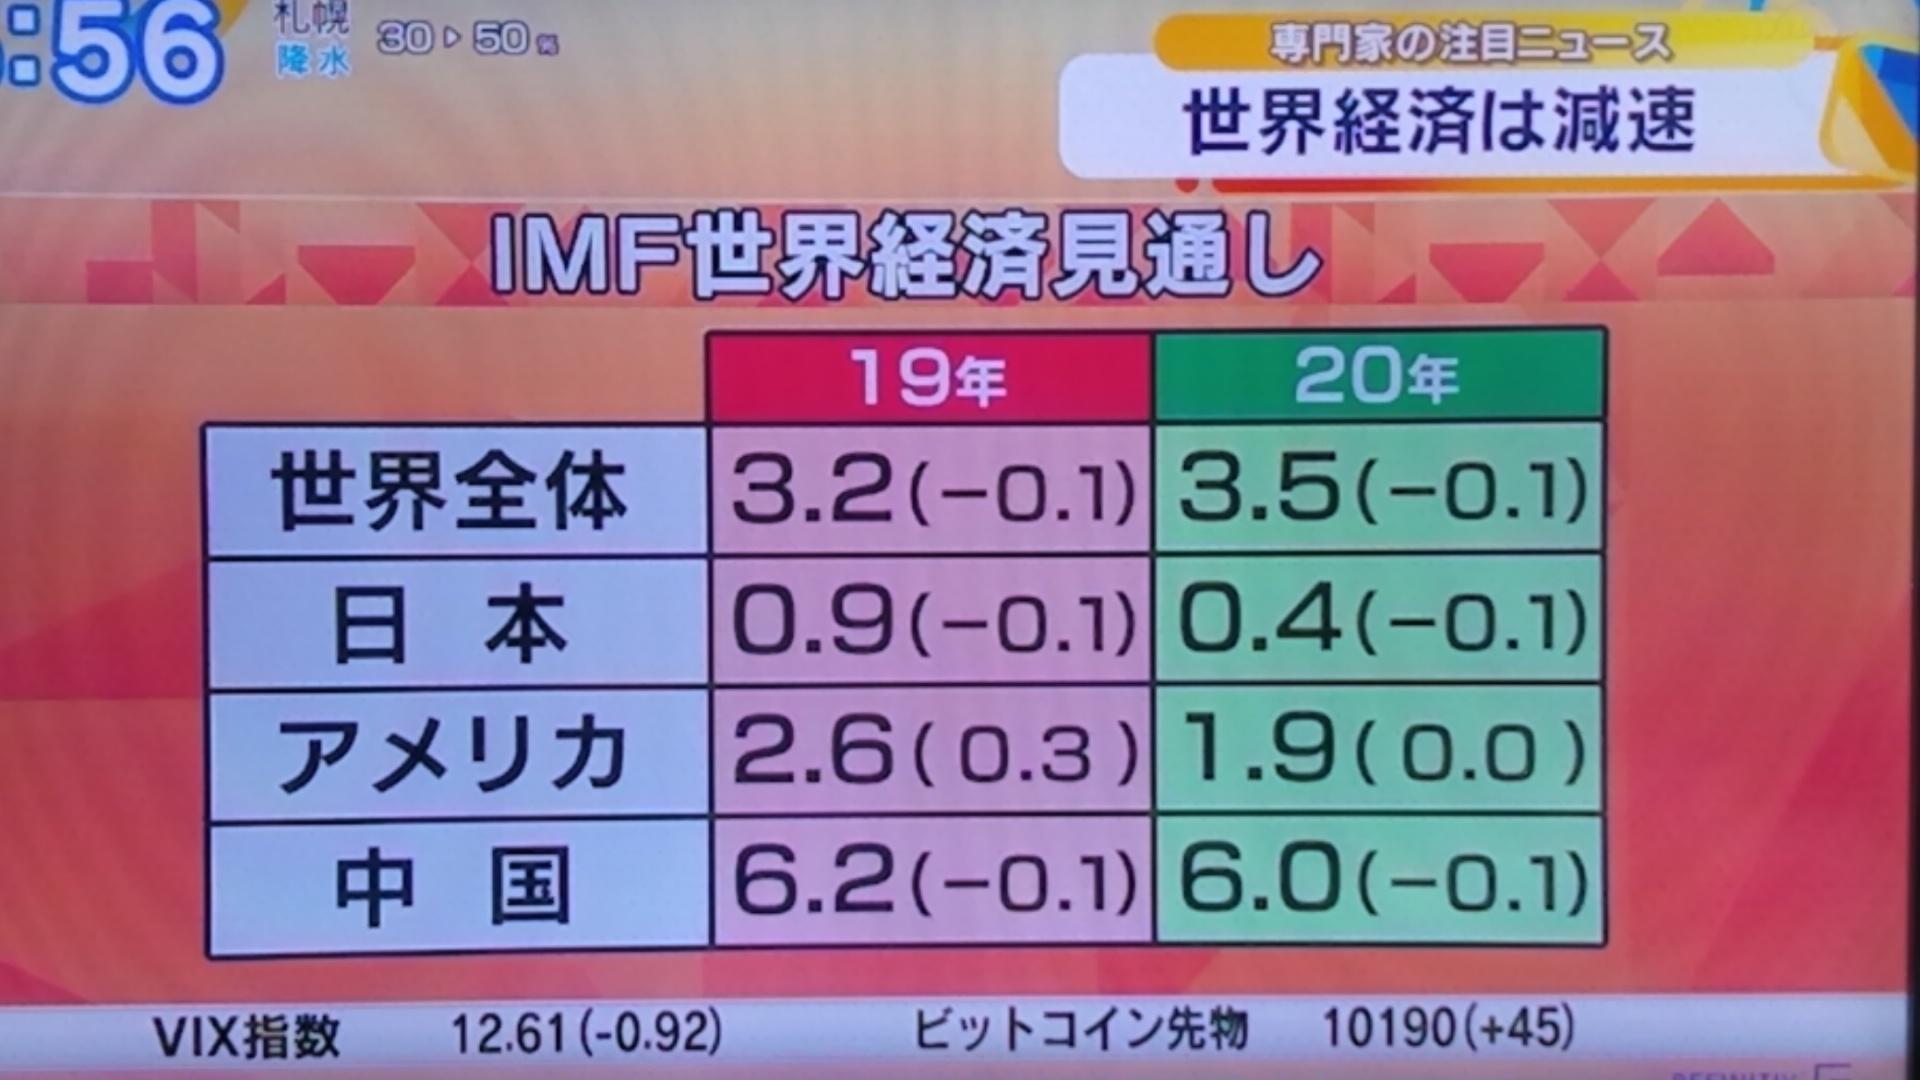 日本経済は減速予想_d0262085_09310831.jpg